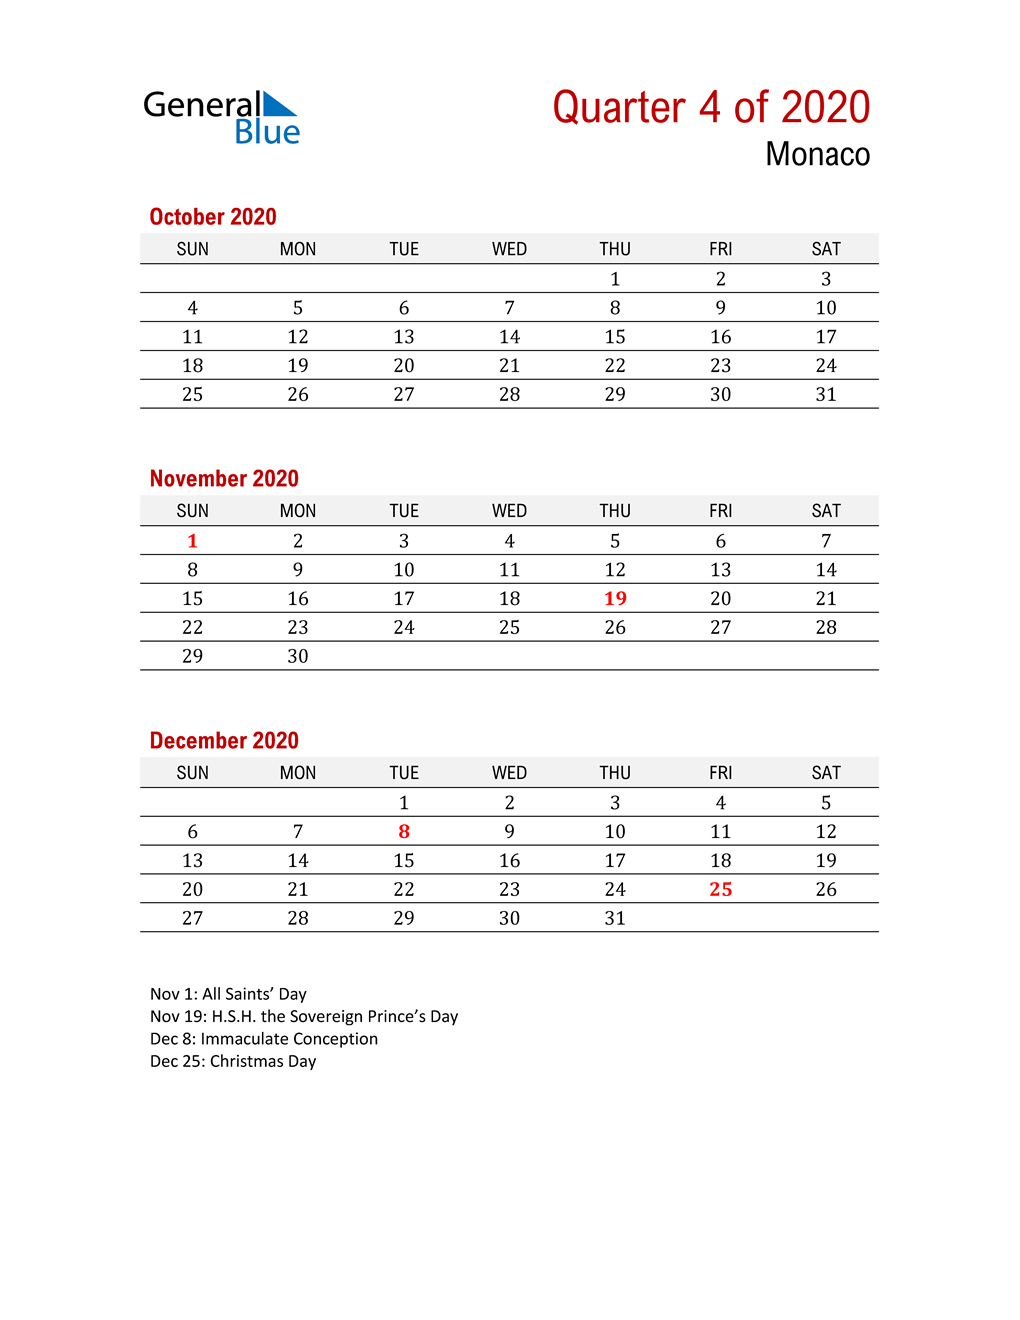 Printable Three Month Calendar for Monaco